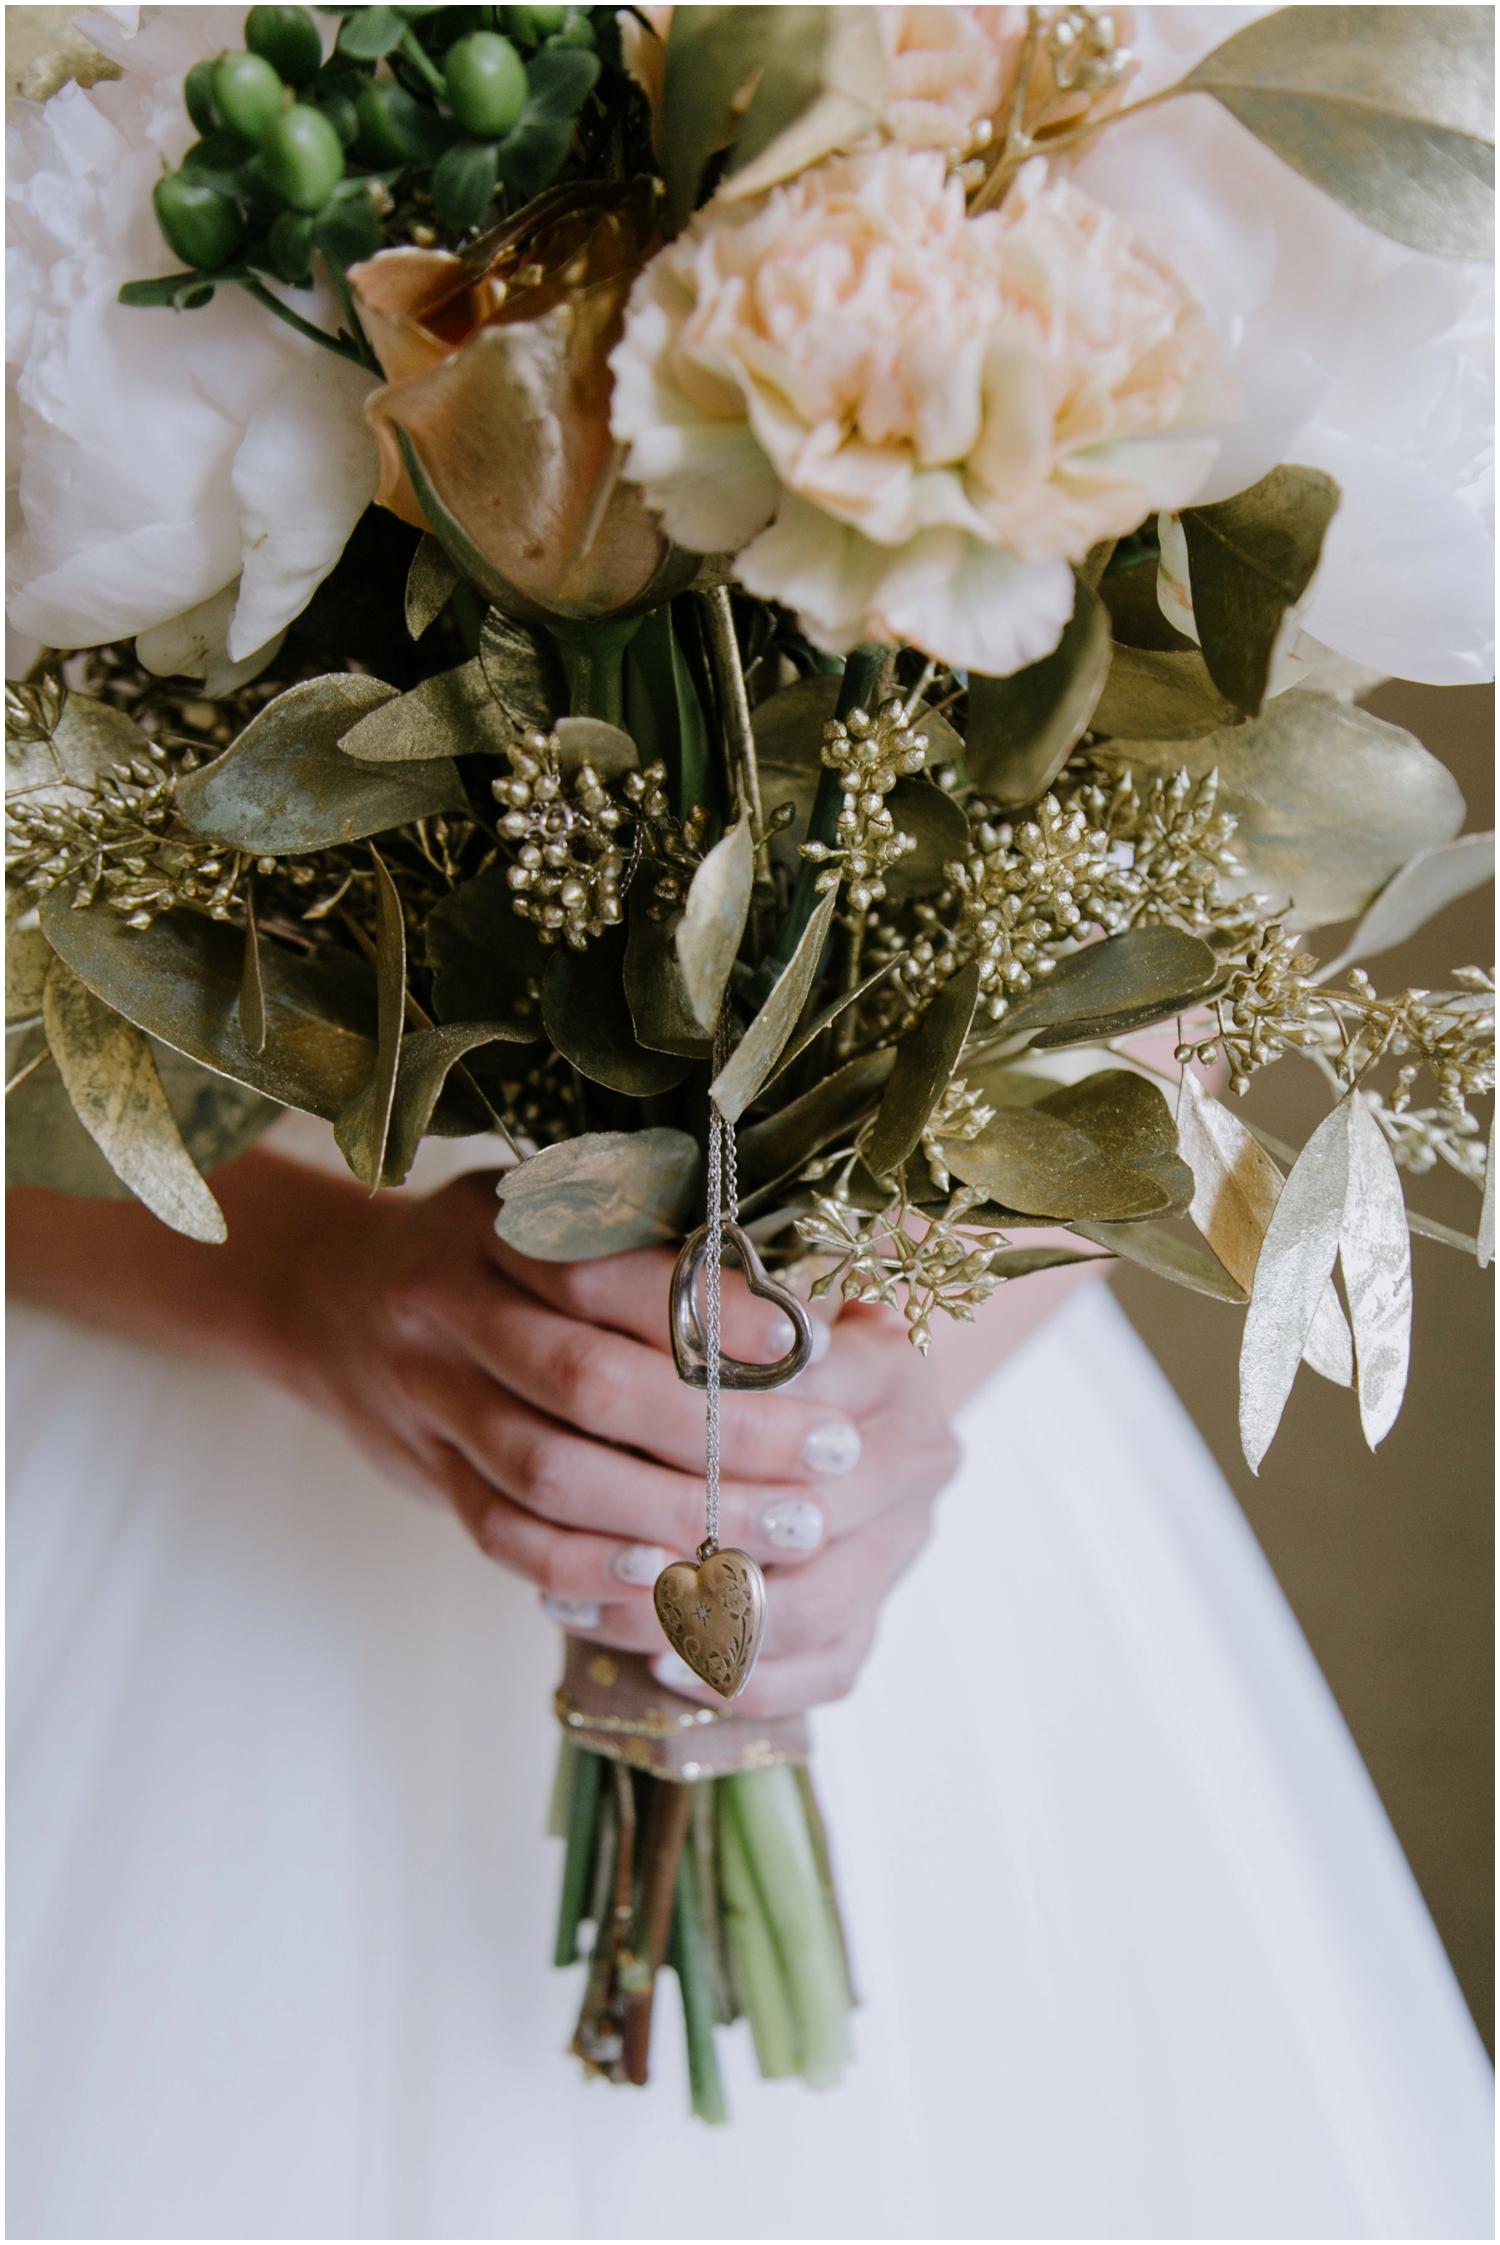 Wedding bouquet, wedding bouquet charm, honolulu hawaii wedding photographer, cafe julia hawaii wedding